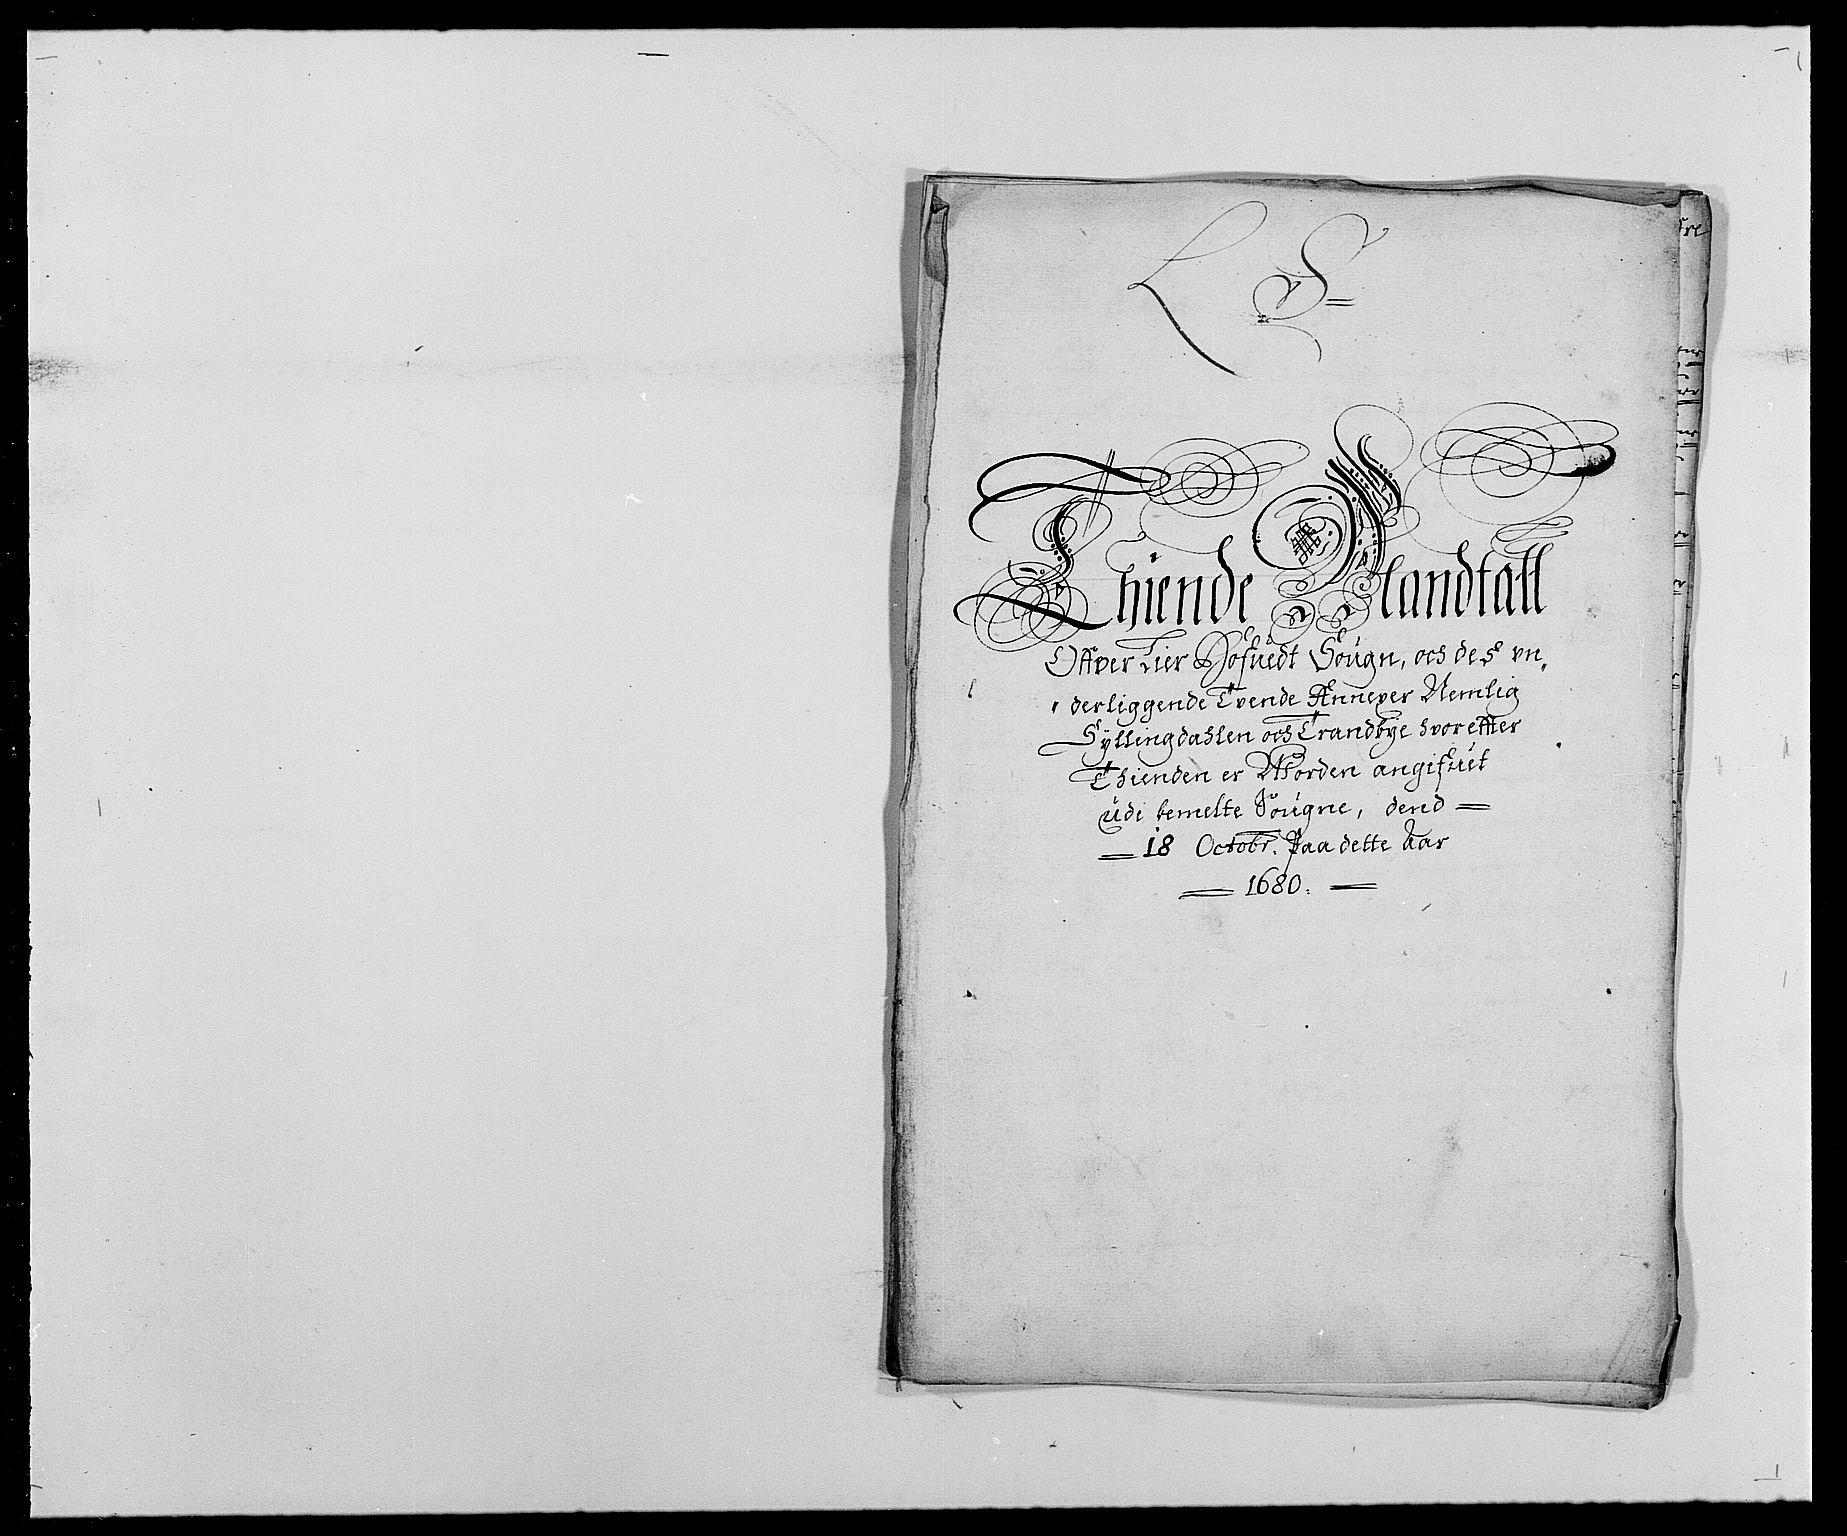 RA, Rentekammeret inntil 1814, Reviderte regnskaper, Fogderegnskap, R27/L1686: Fogderegnskap Lier, 1678-1686, s. 225